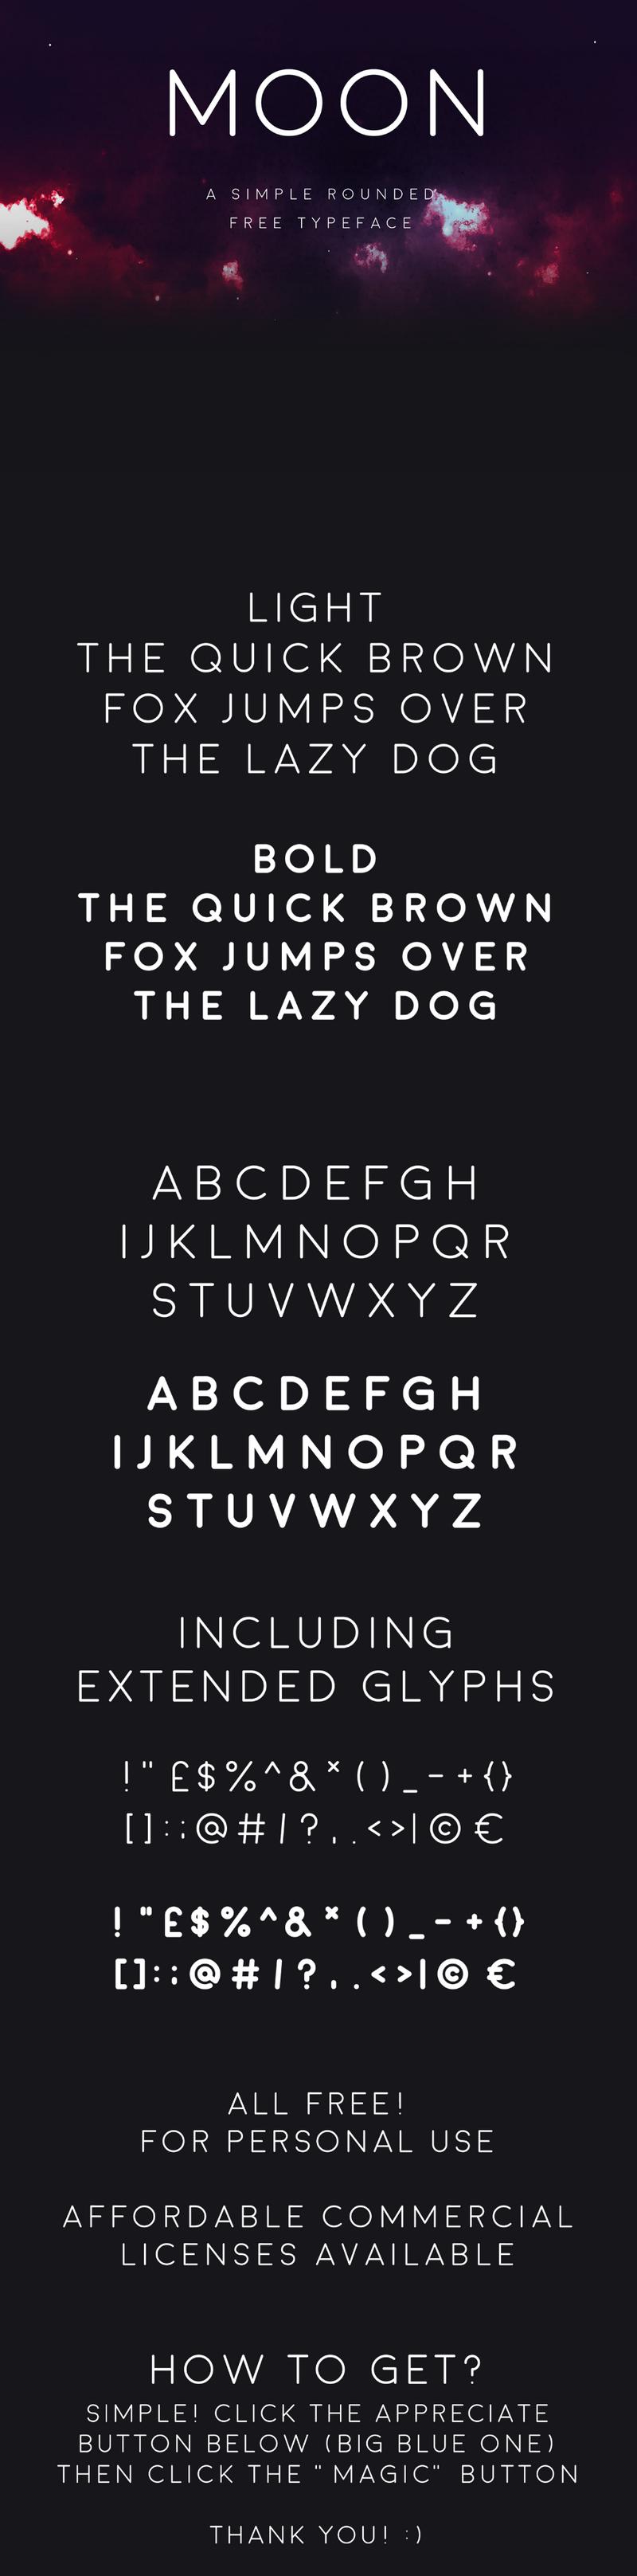 Moon Free Sans Serif Typeface